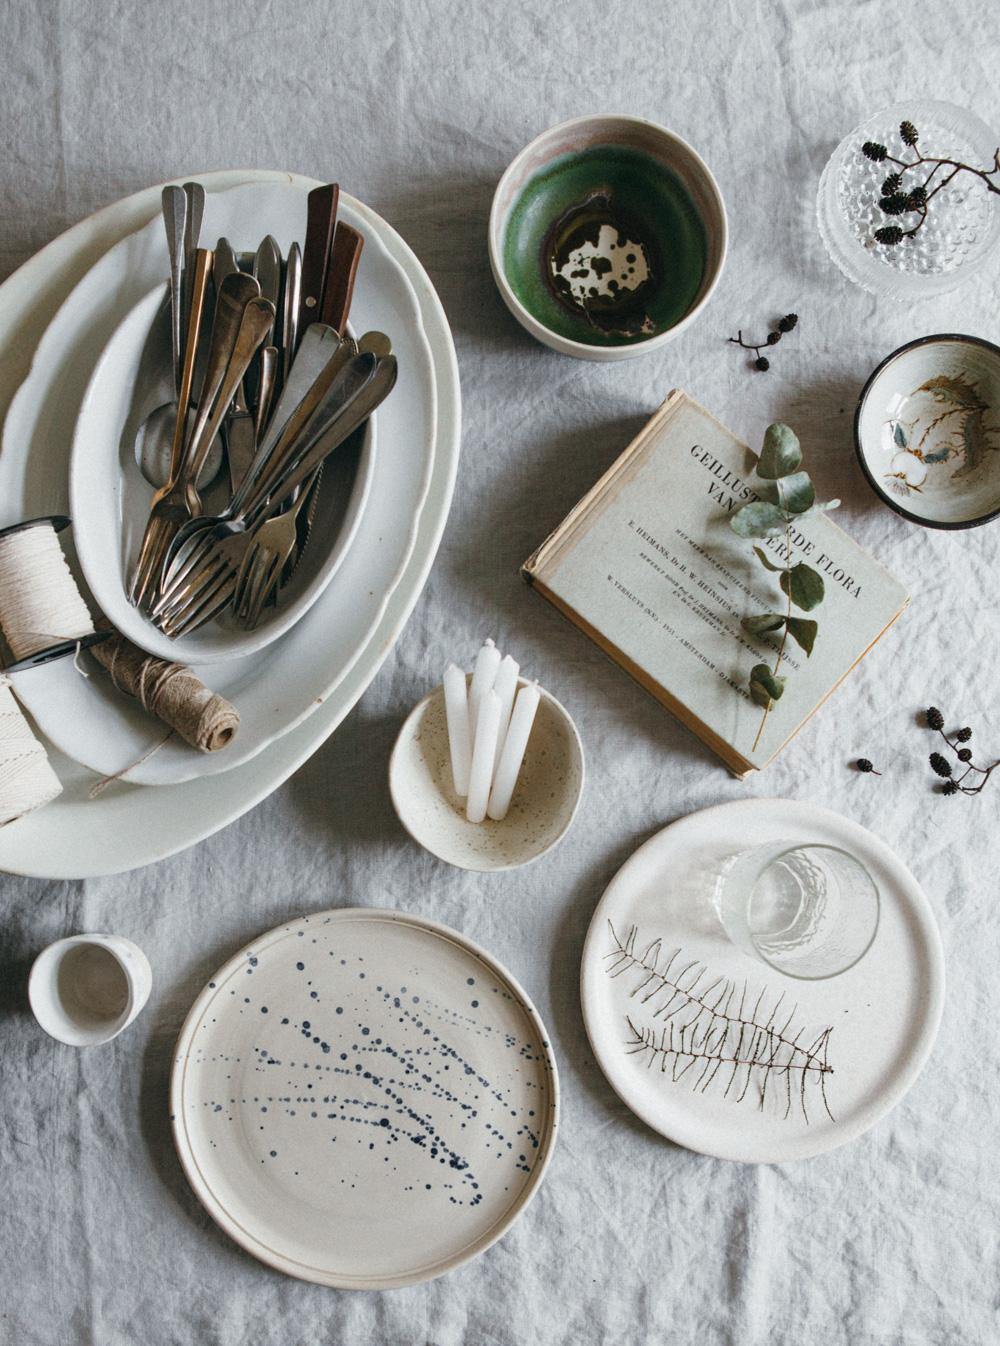 winter-tablesetting-inspire-styling-1-of-17.jpg